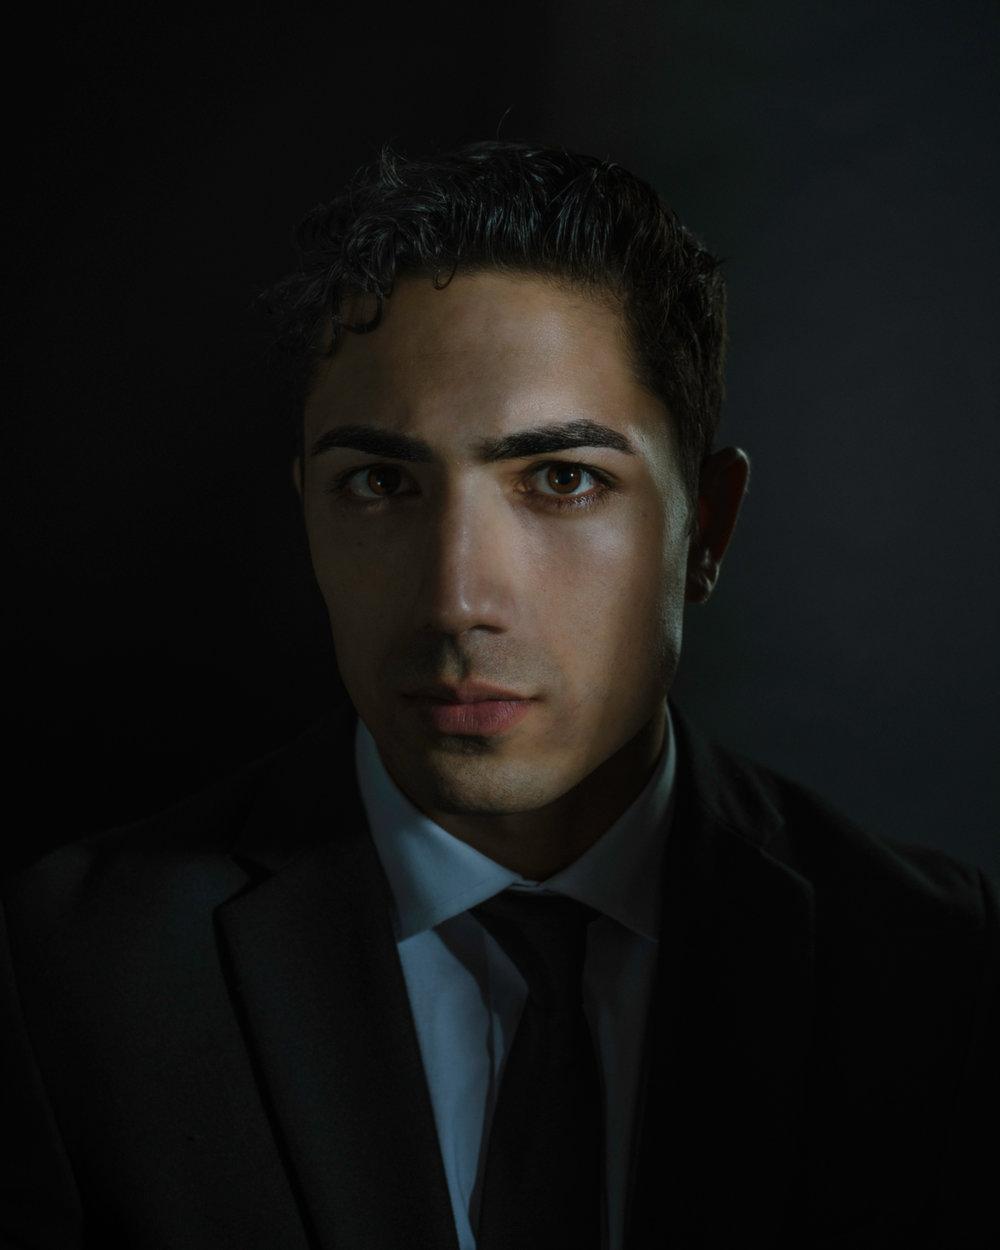 Ryan-Angel-Studio_RAS1091a.jpg